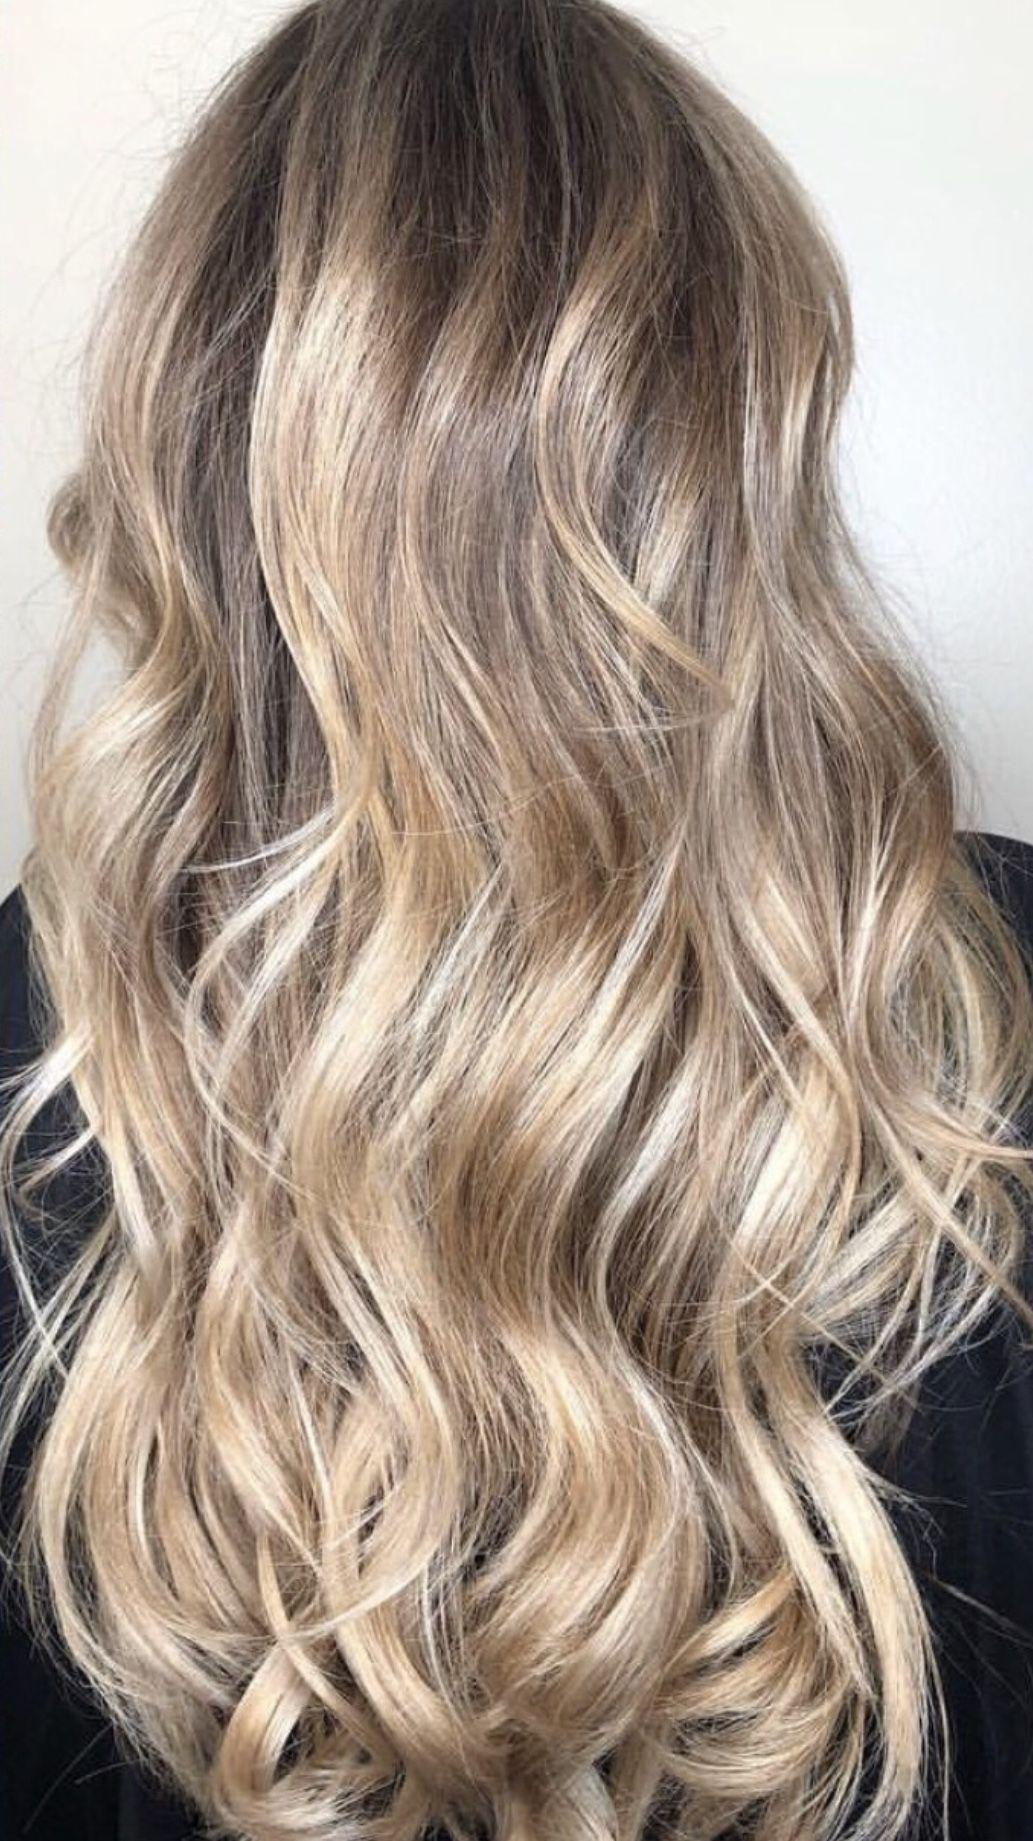 Icy blonde balayage hair blonde balayage curly icy longhair